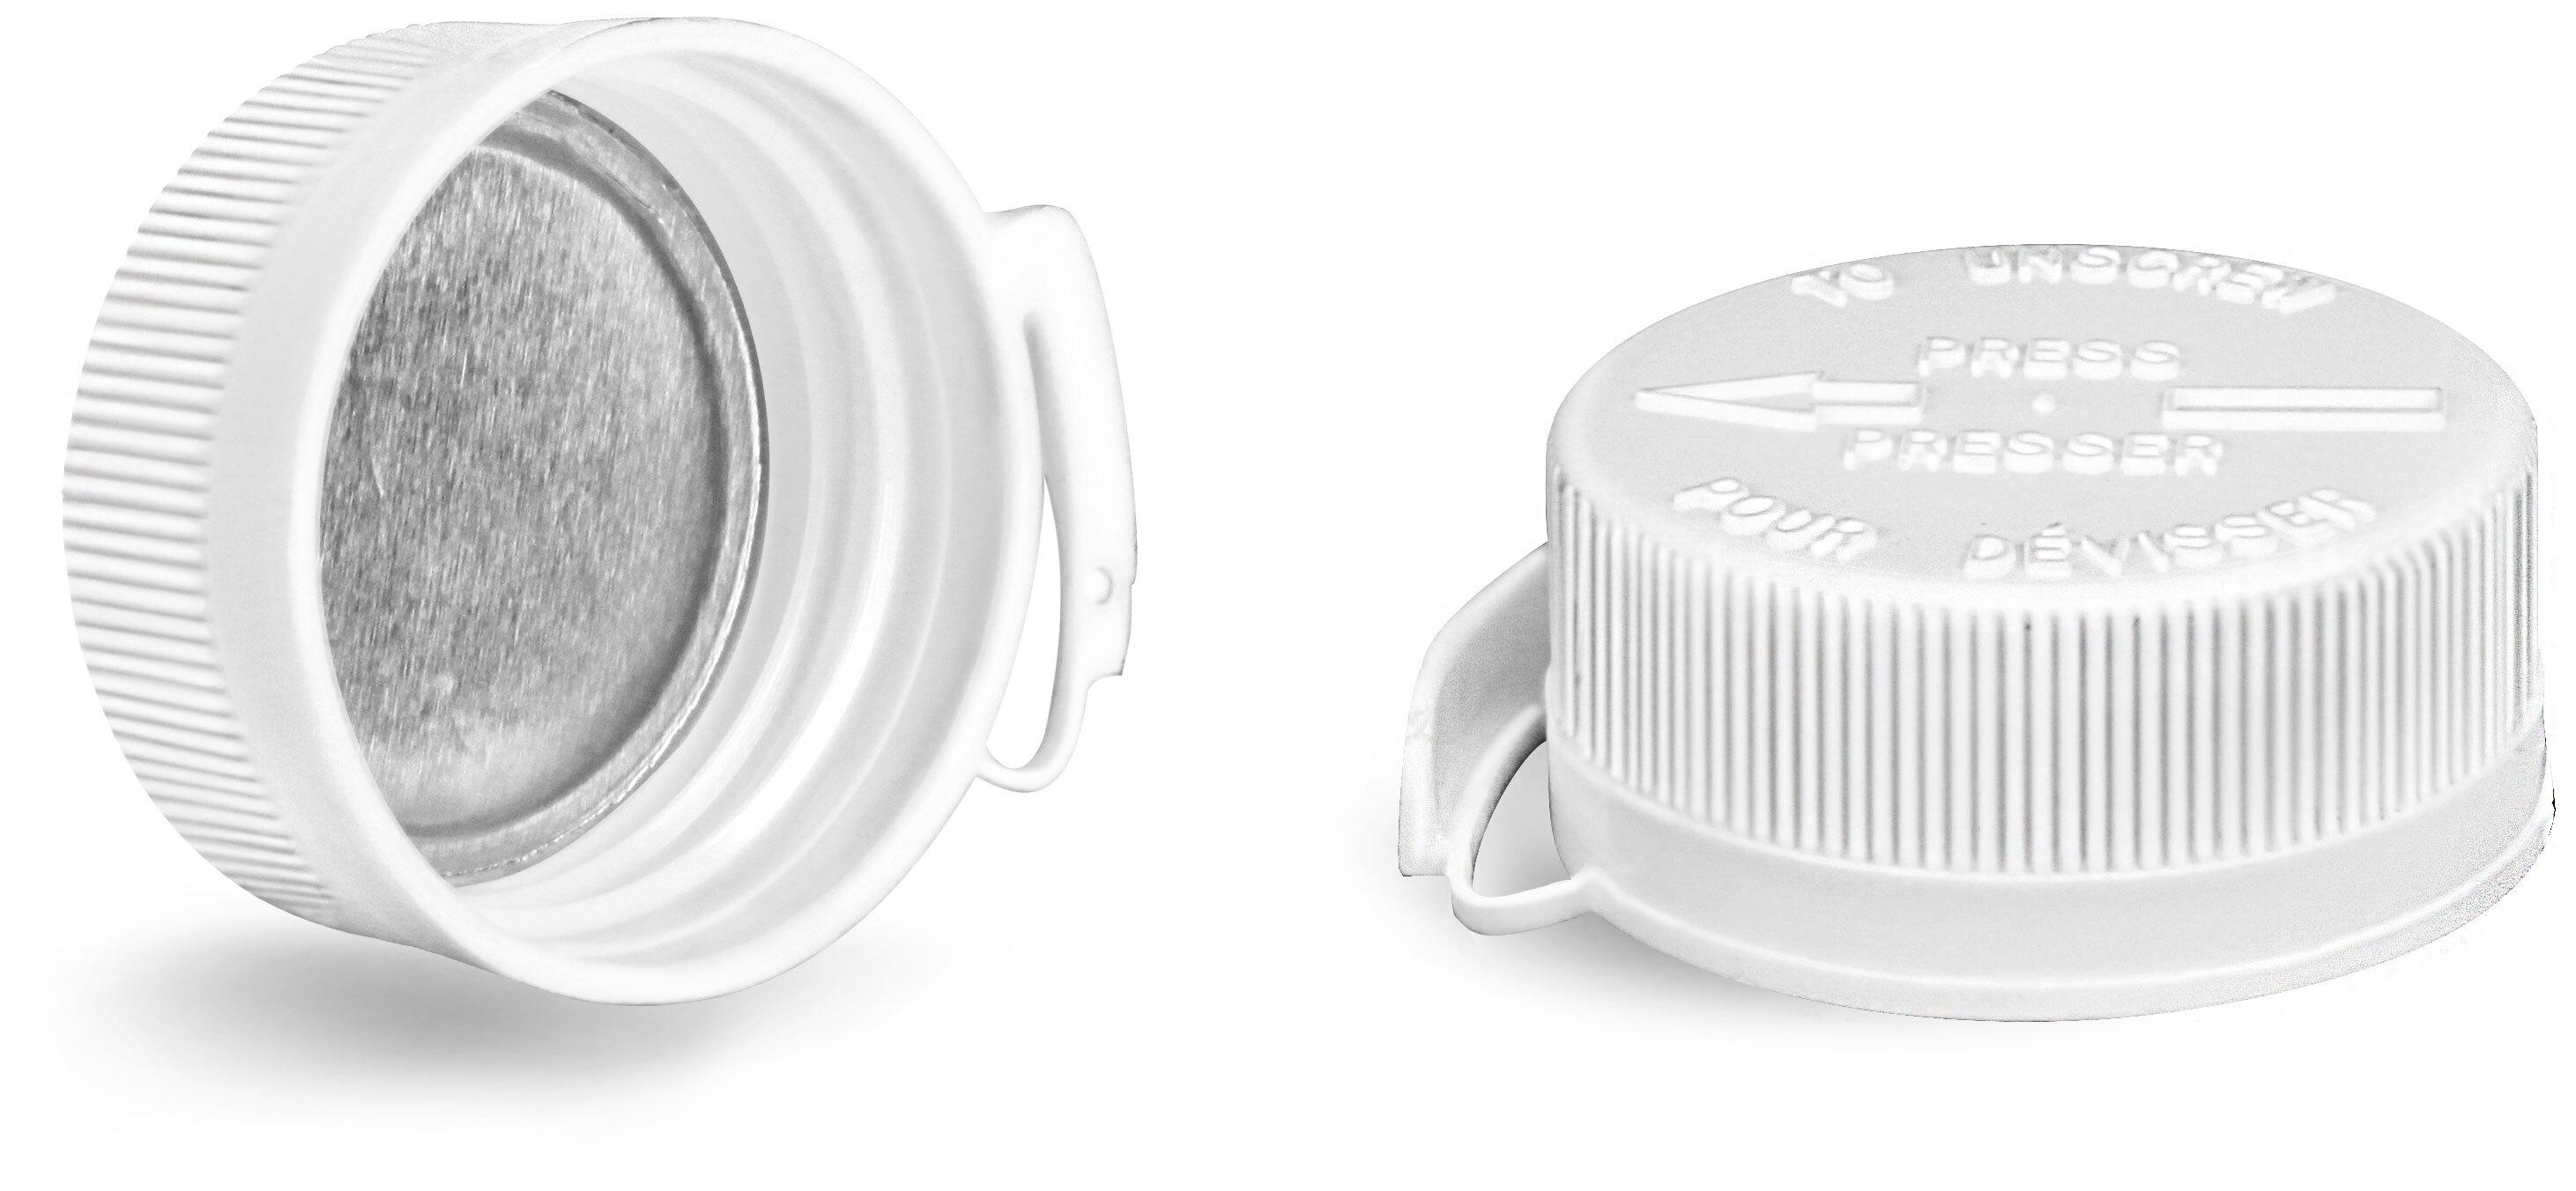 Plastic Caps, White Child Resistant Snap Lok Cap w/ Pulp to PE Liners